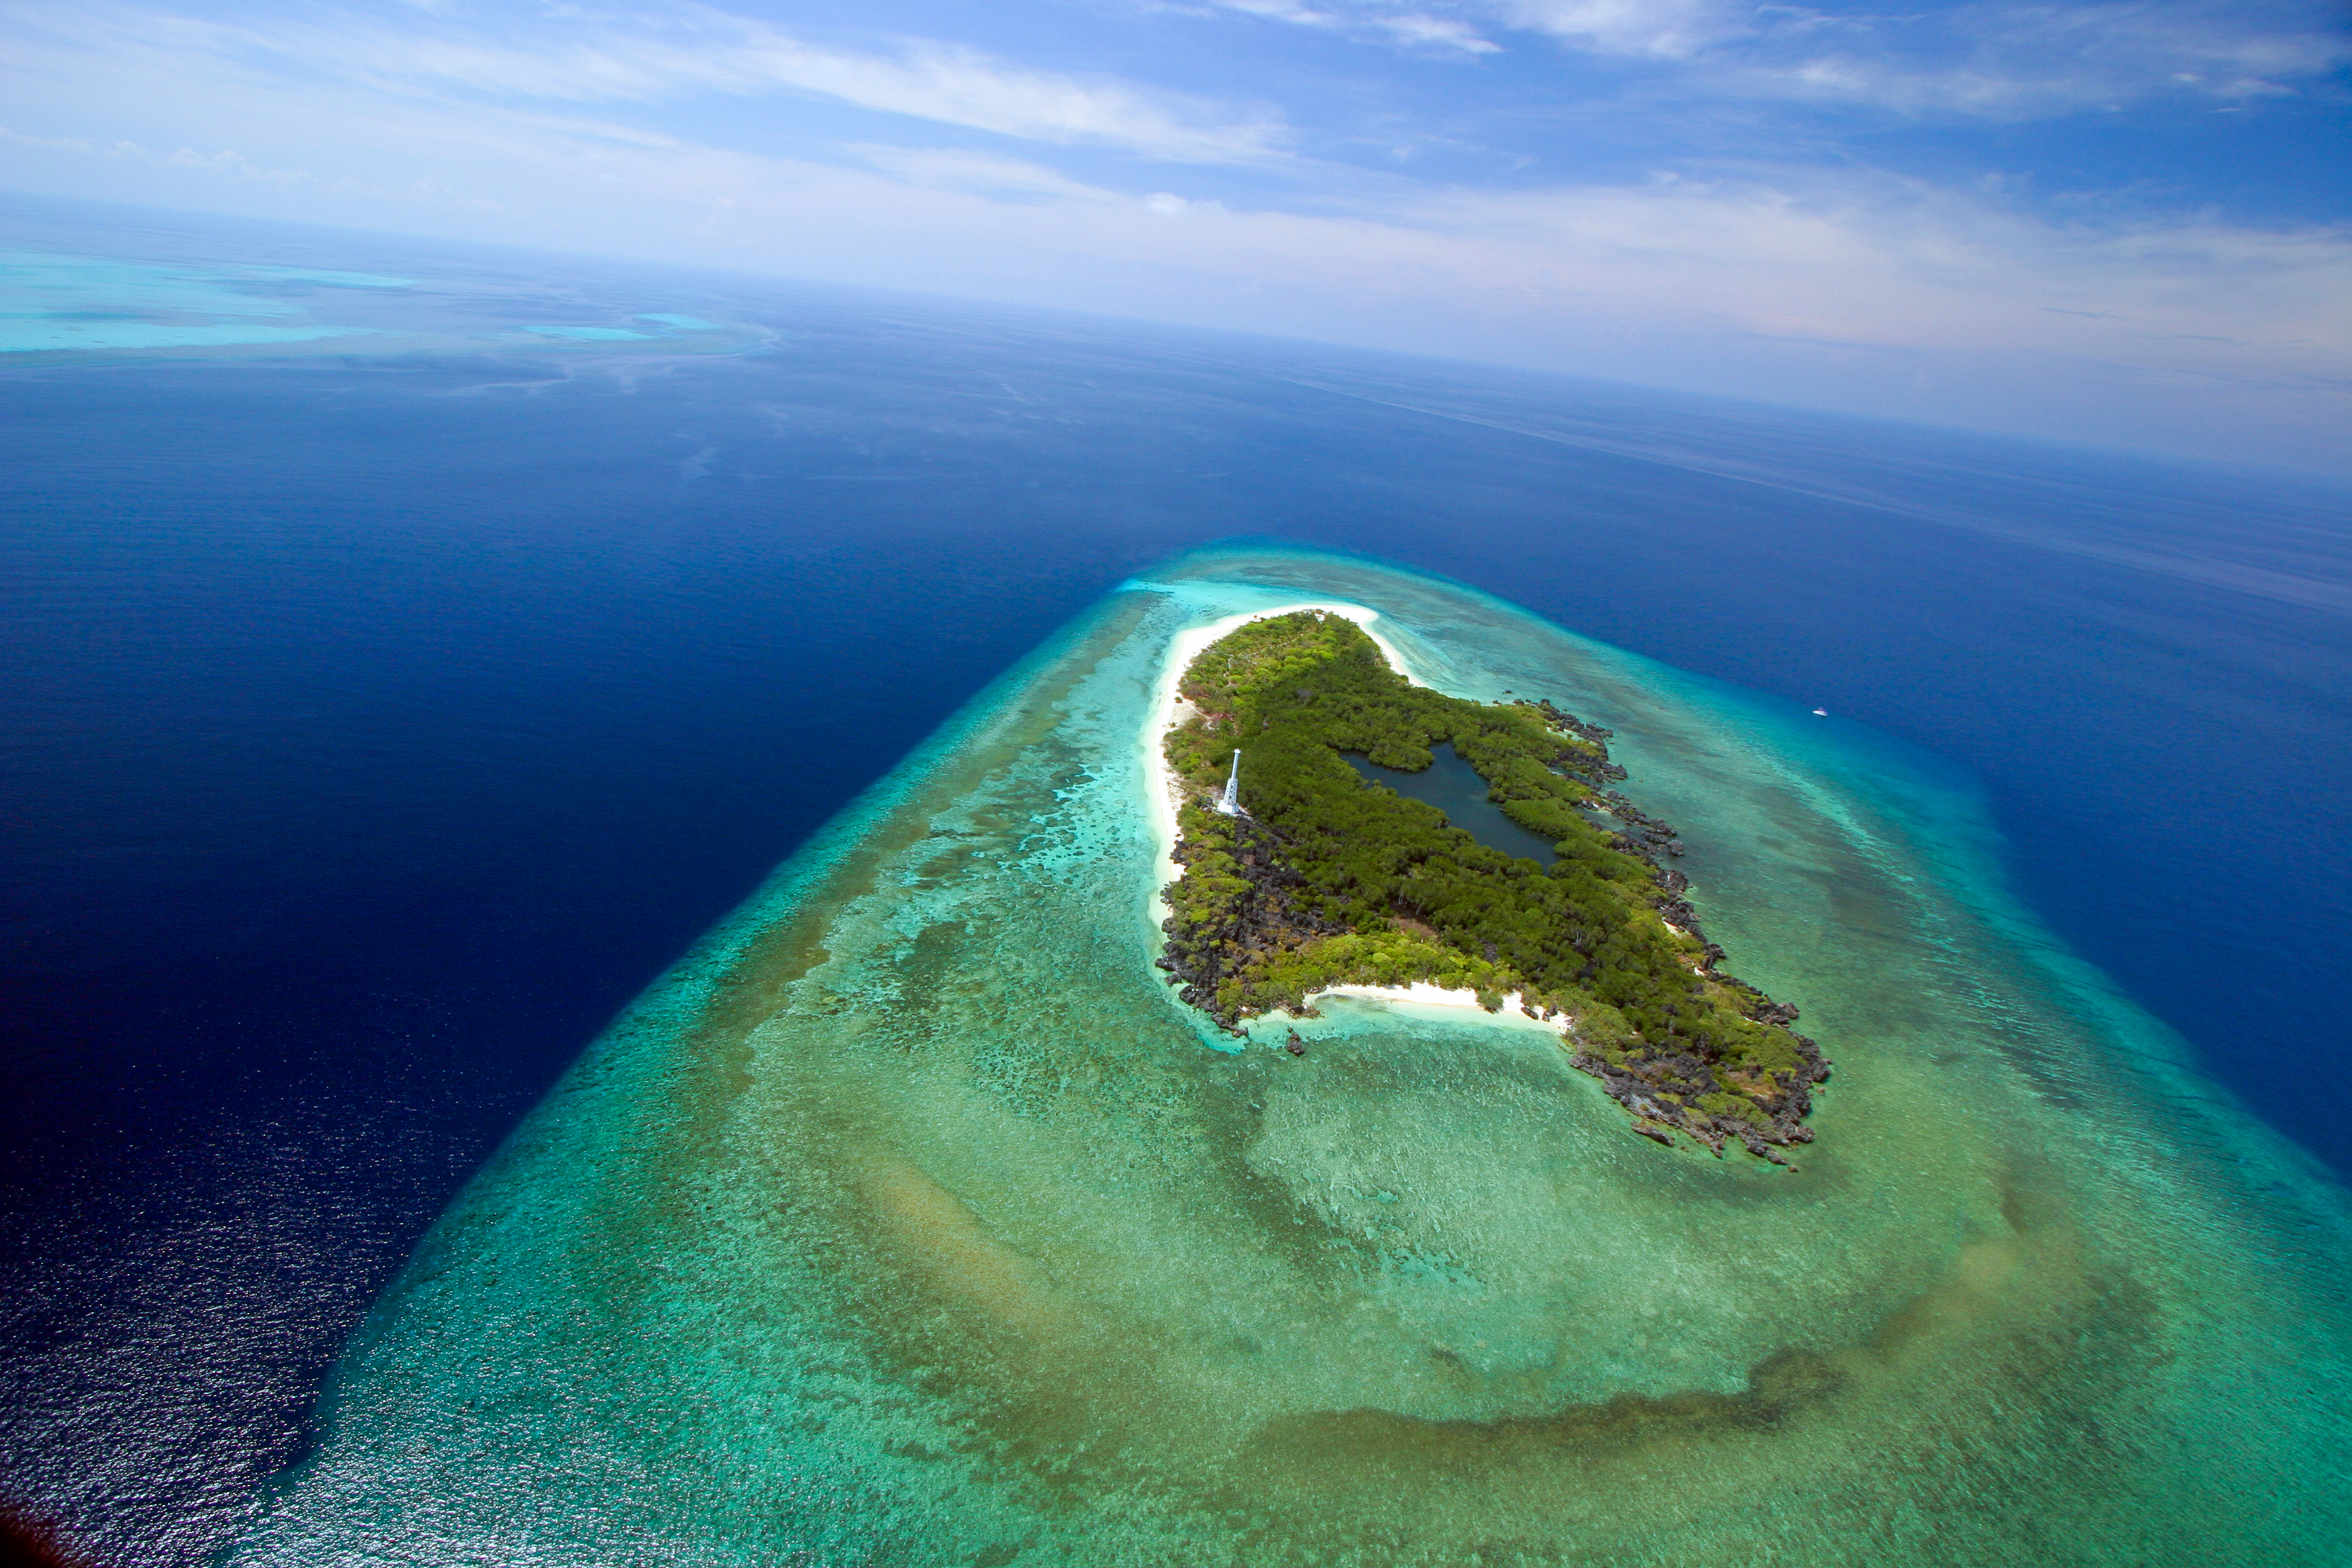 Drohnenaufnahme vom Taucherparadies Apo Reef bei Mindoro - Philippines DOT ©David-Hettich